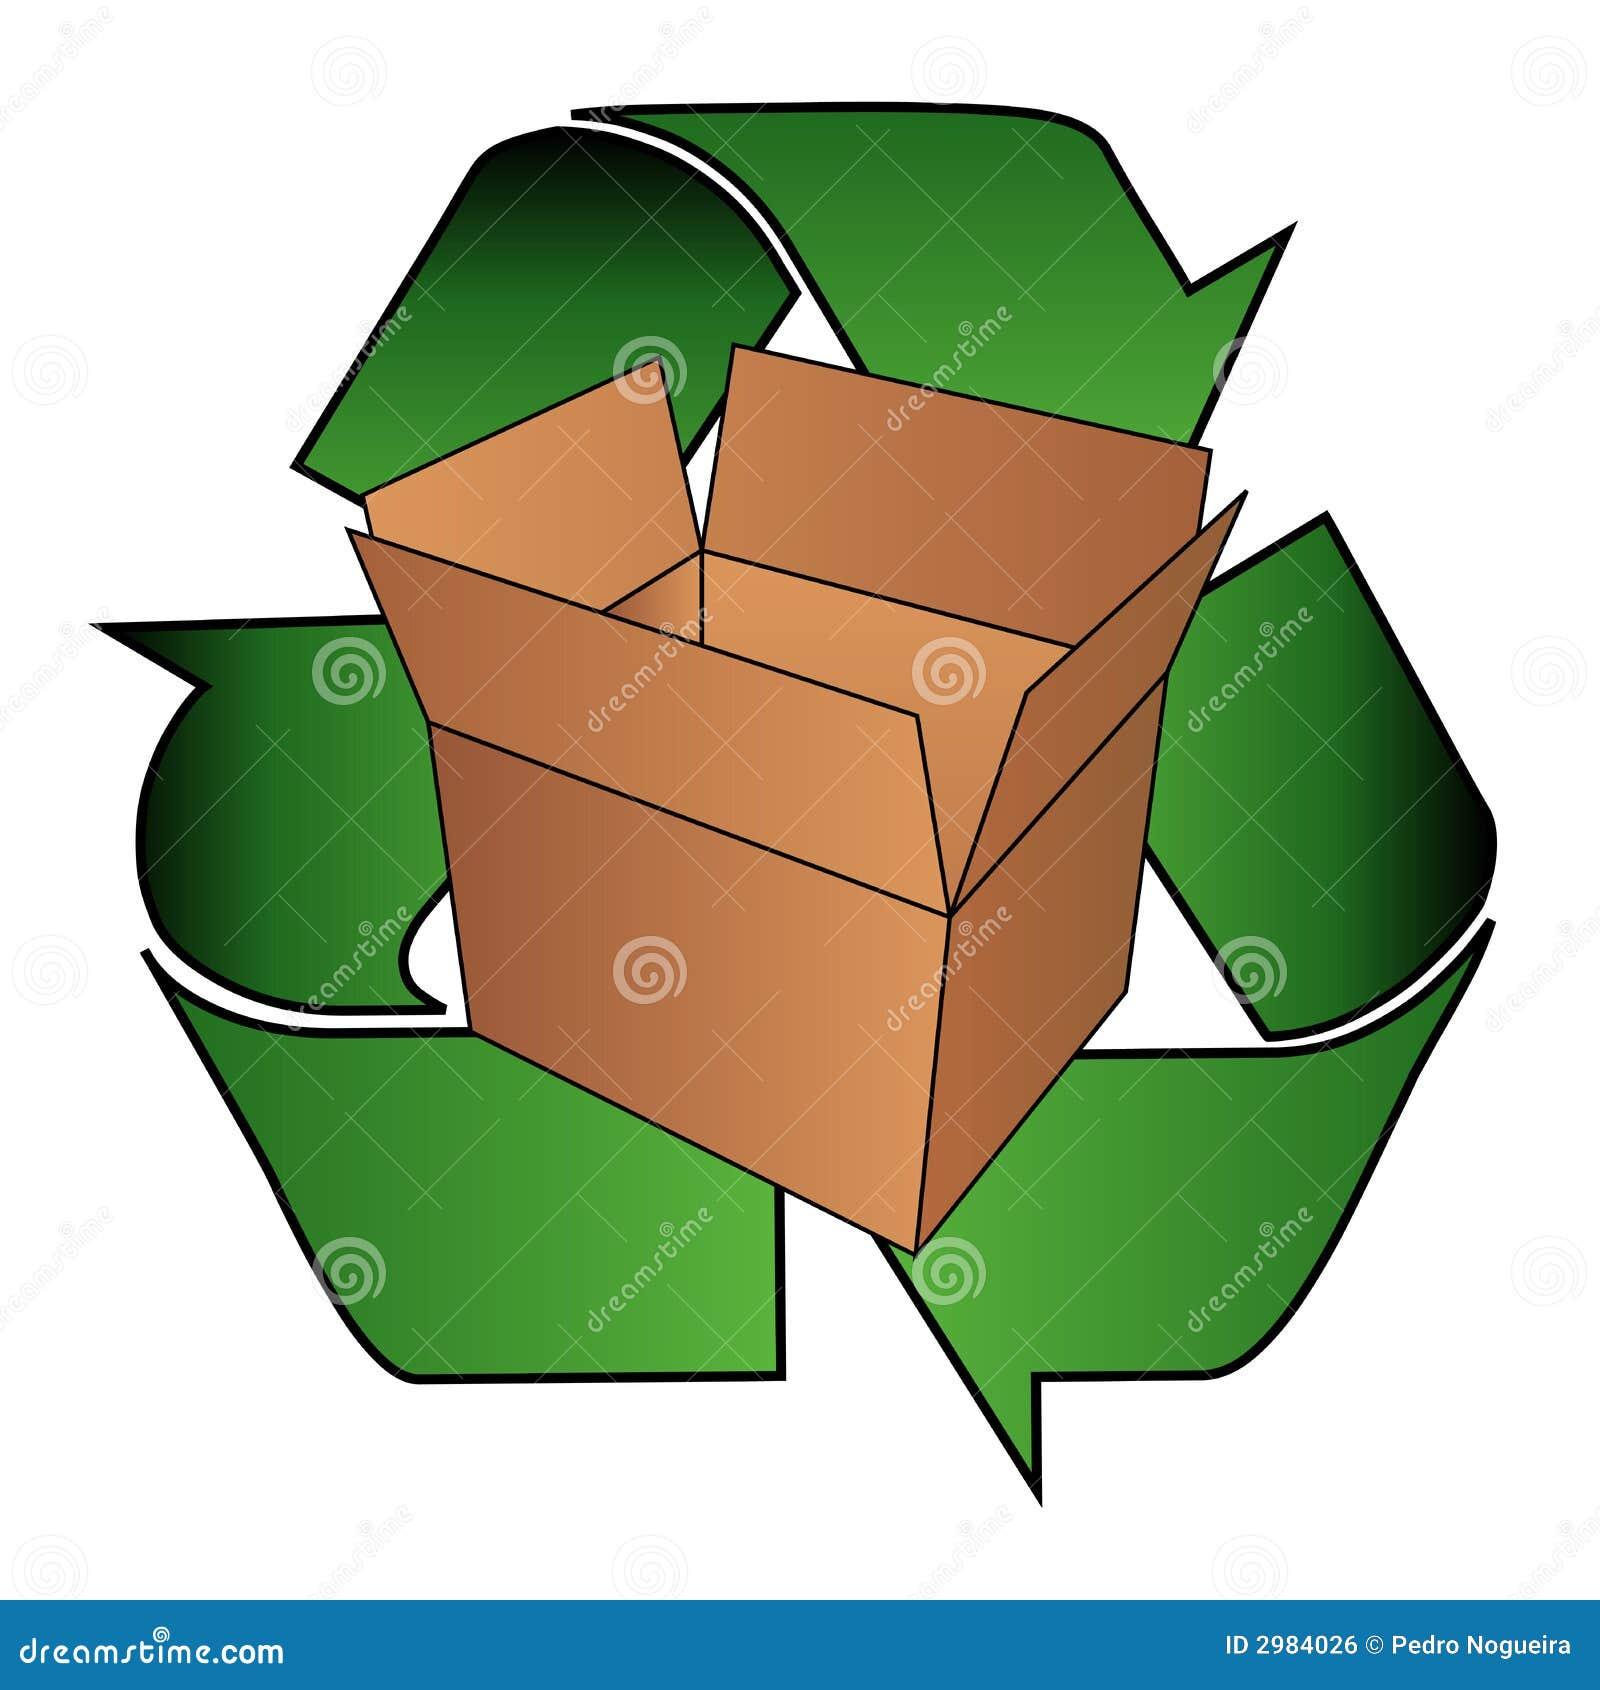 La Caja De Cart 243 N Recicla S 237 Mbolo Imagen De Archivo Libre De Regal 237 As Imagen 2984026